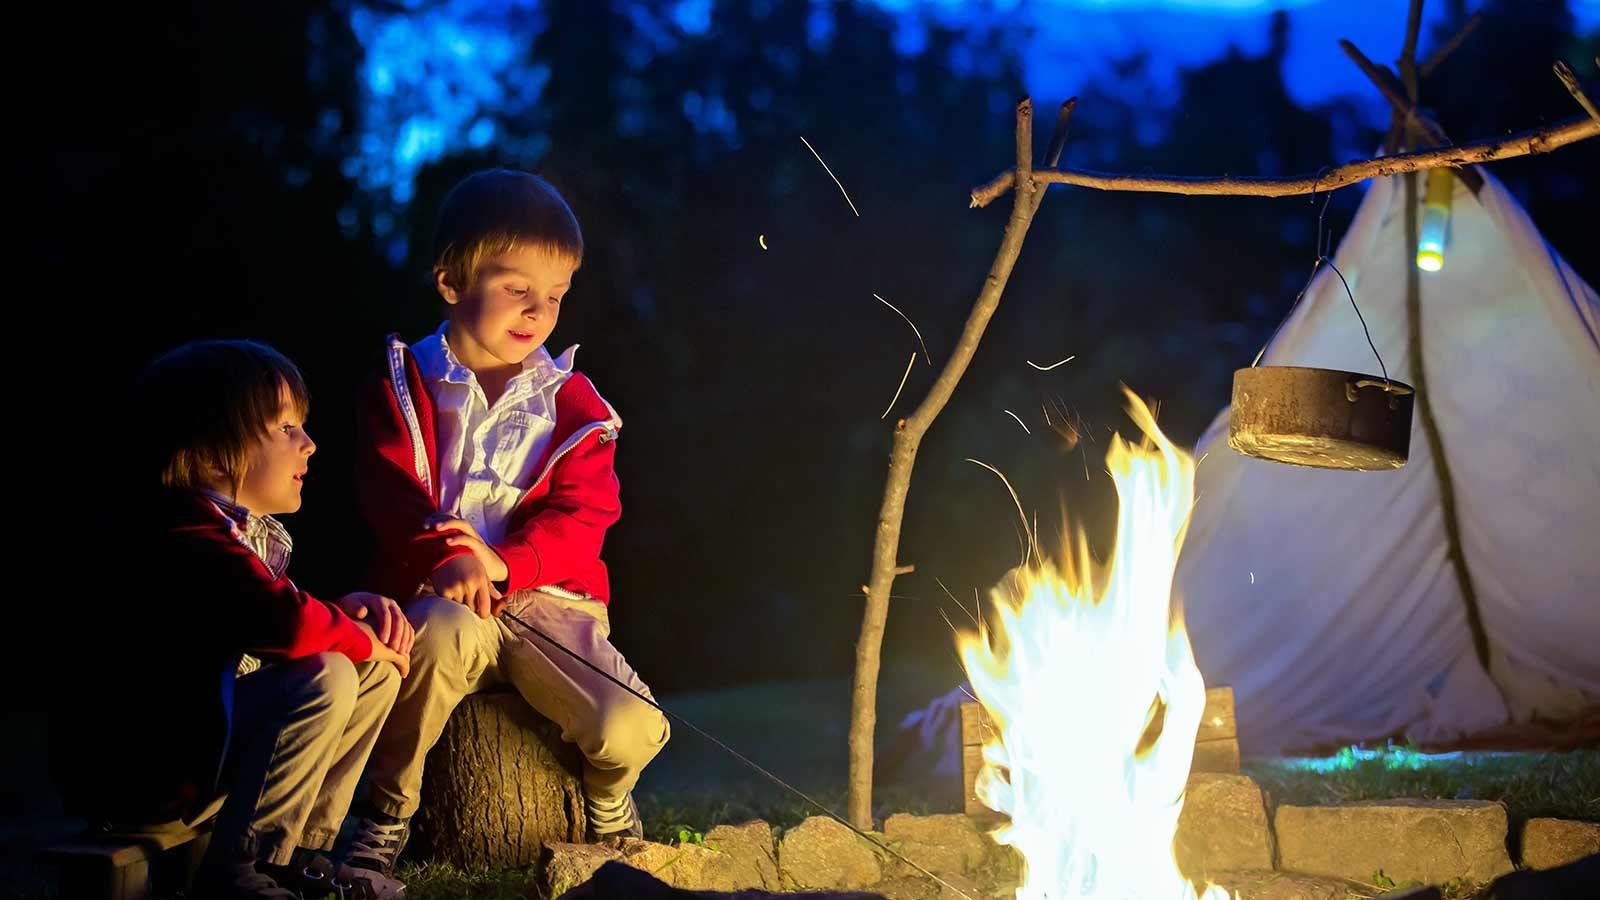 Kids sitting around a backyard campfire.